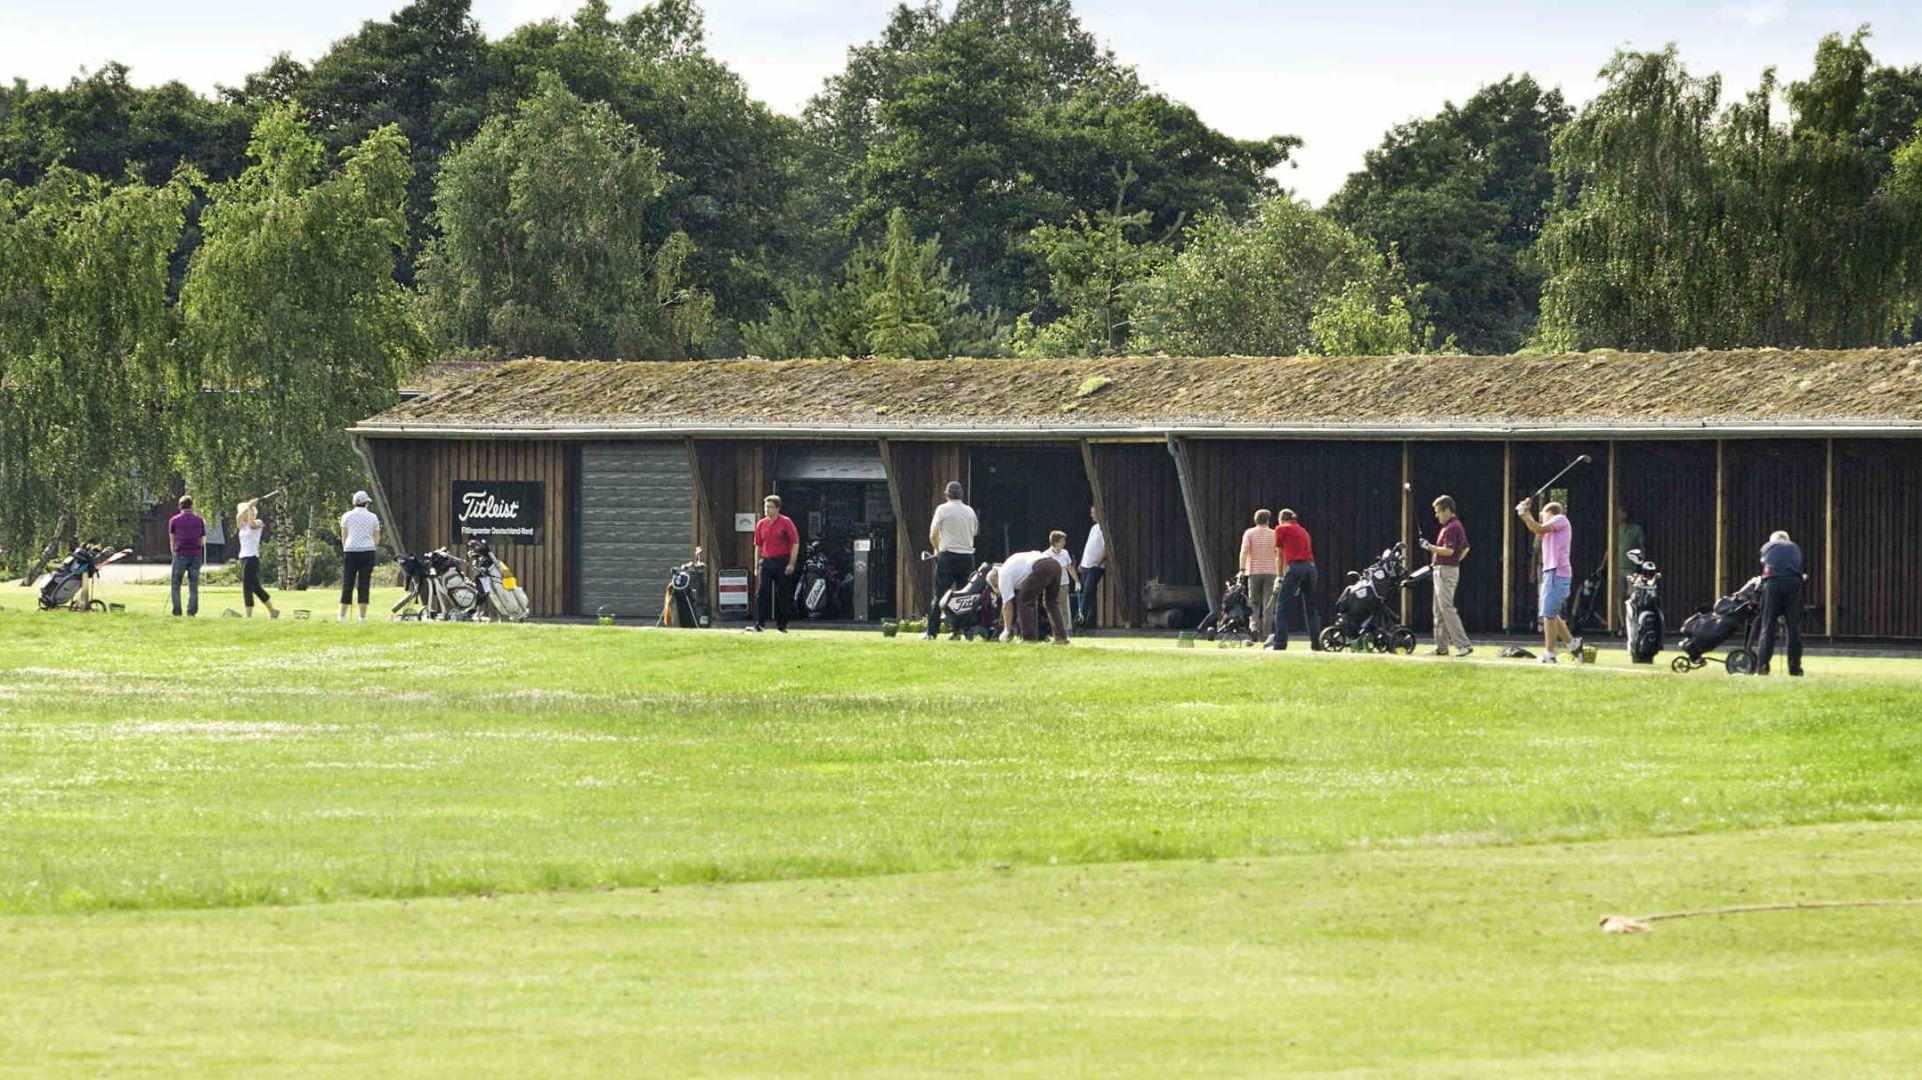 Golfplatz in Winsen/Luhe